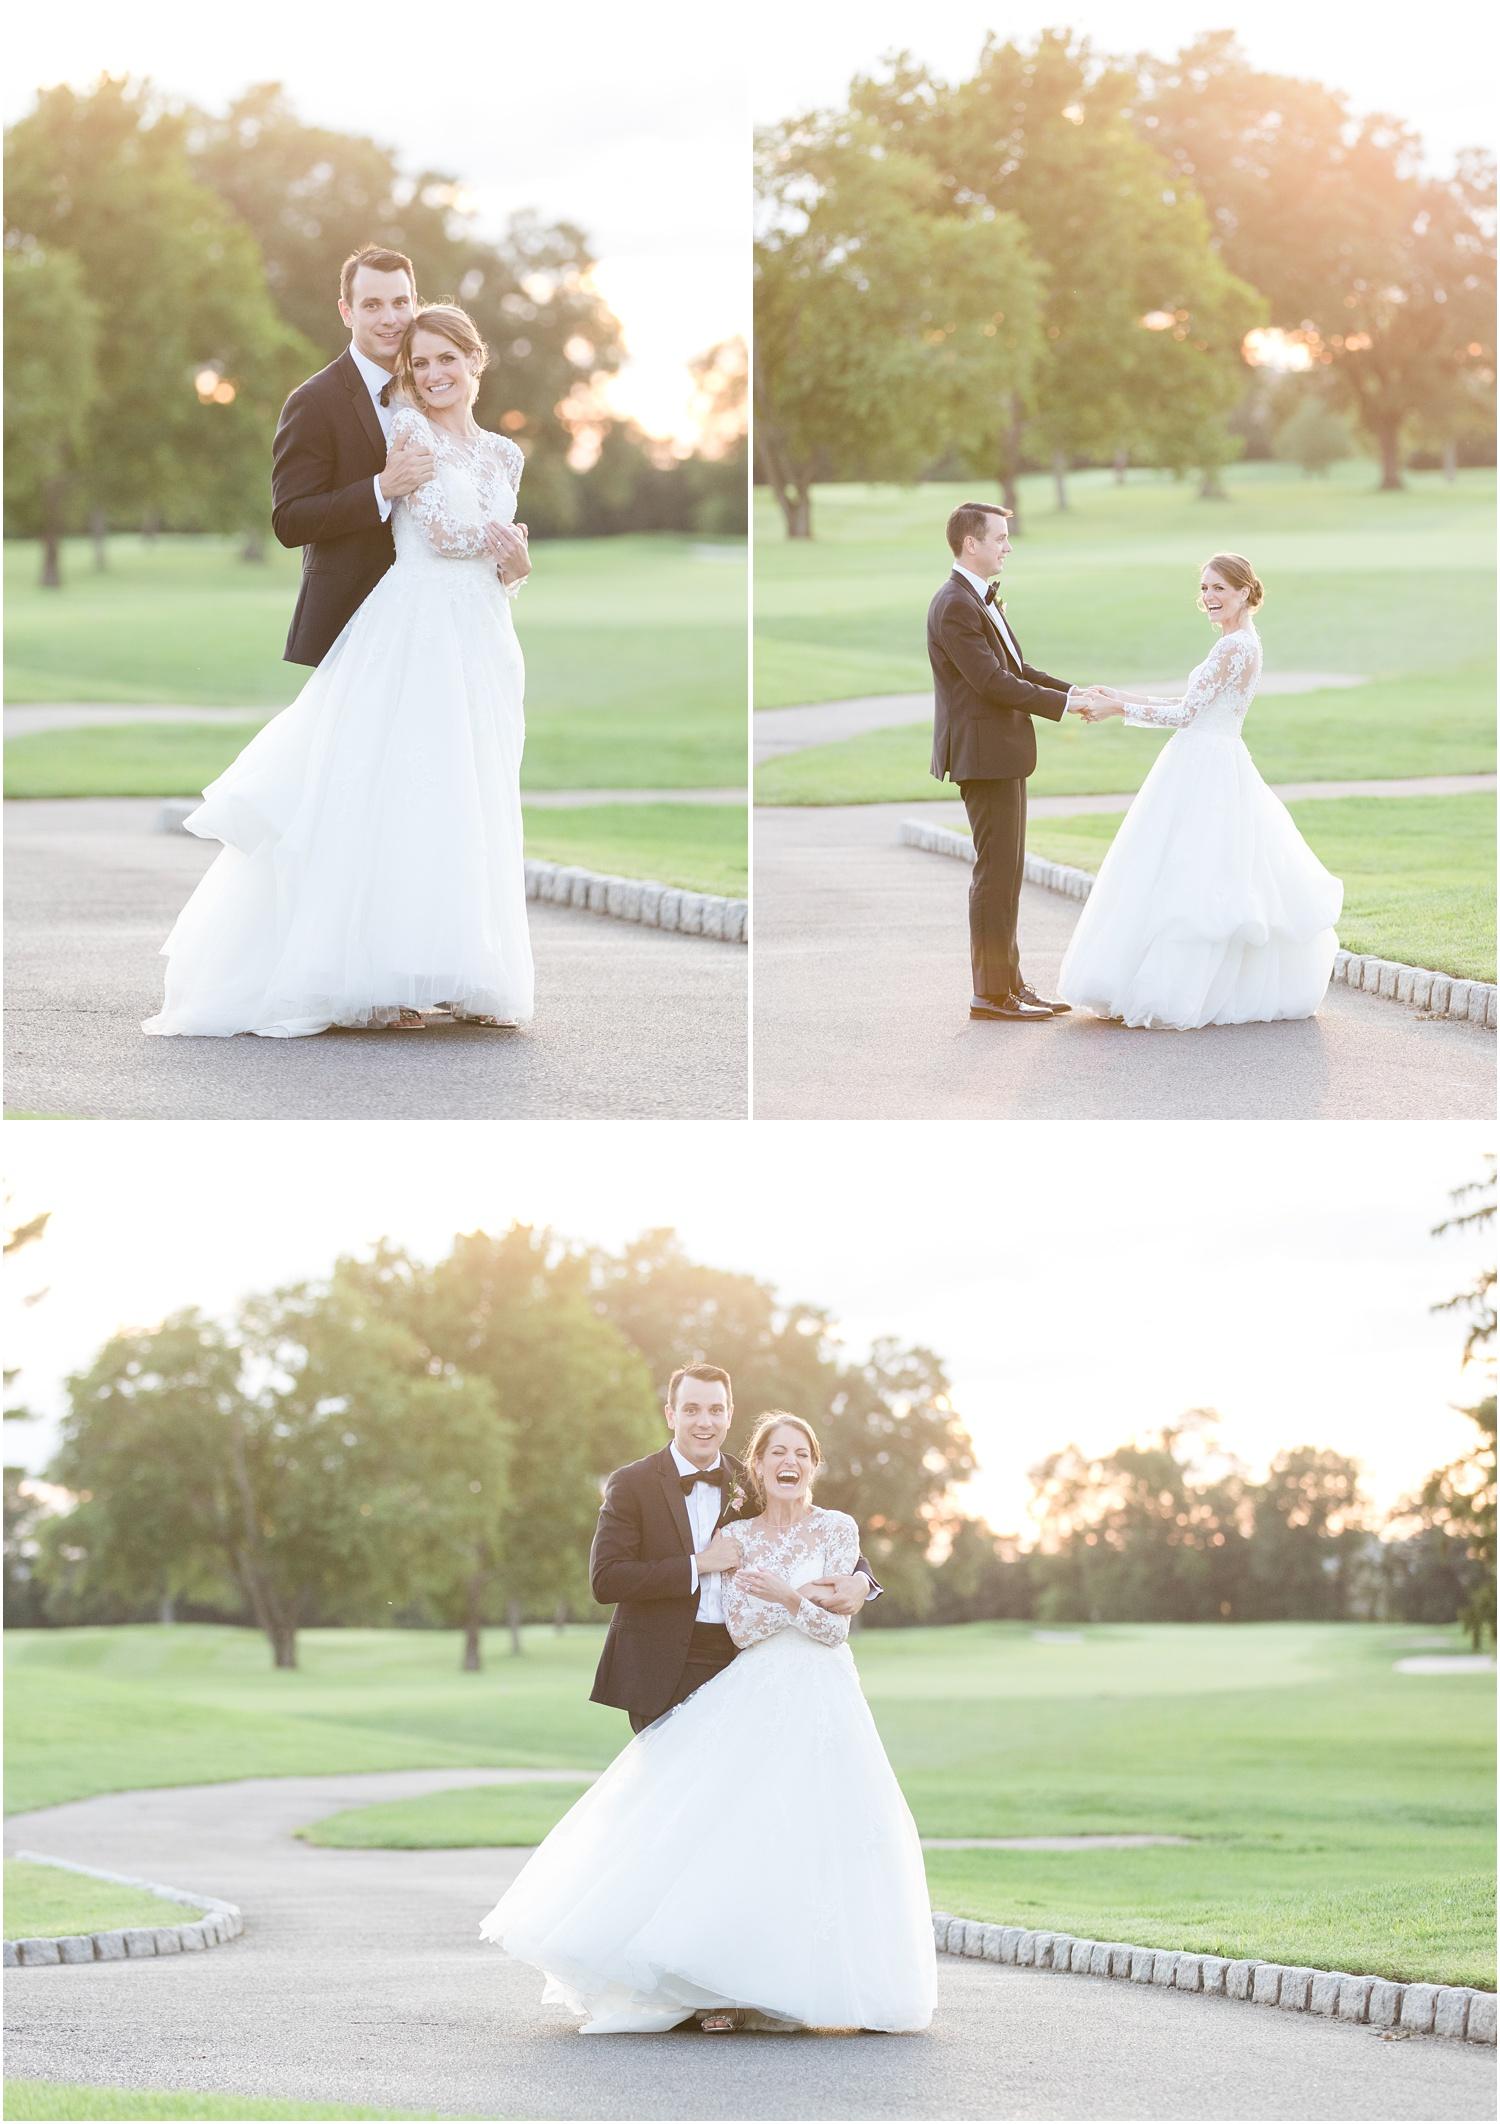 Sunset wedding photos at Canoe Brook Country Club